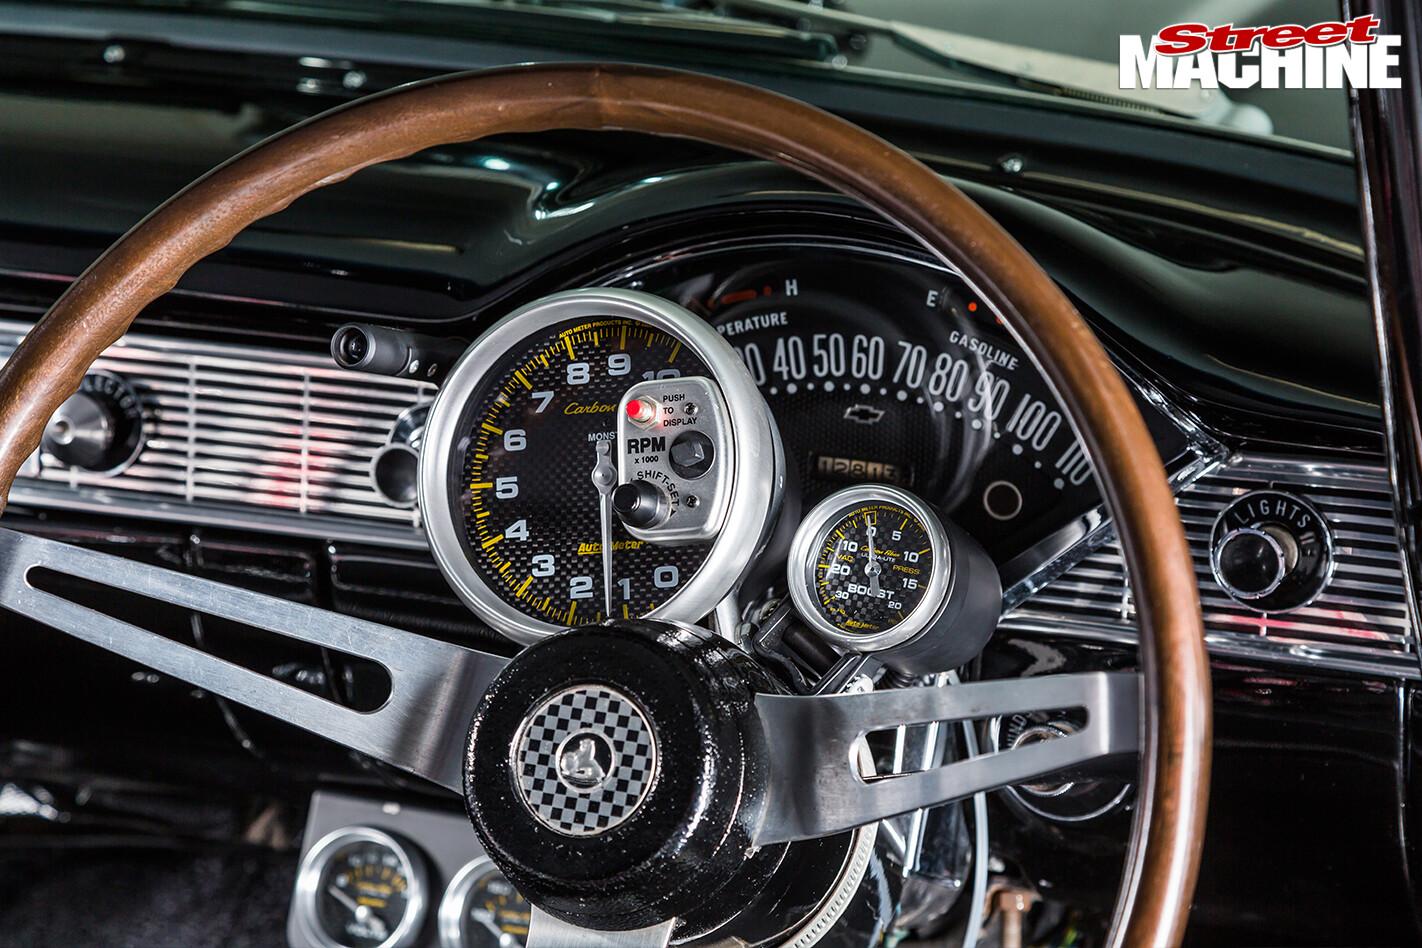 1957-Chevrolet -dash